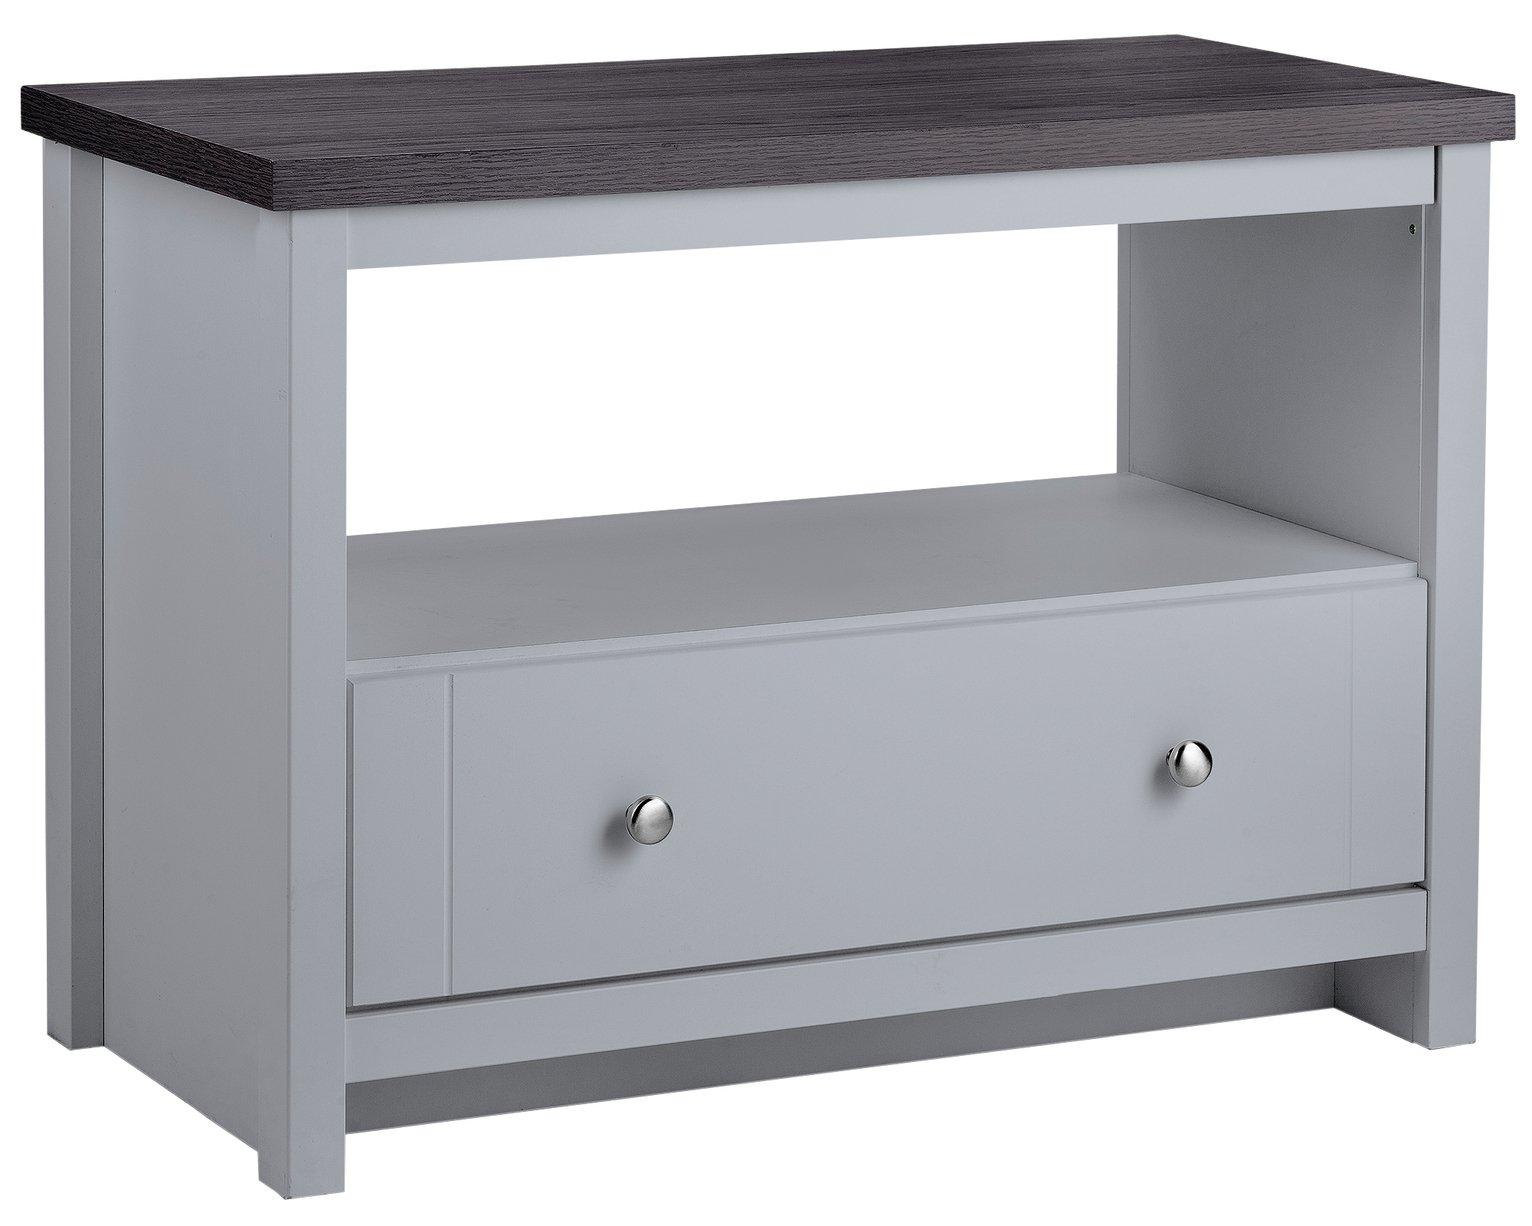 Argos Home Westbury 1 Drawer 1 Shelf Coffee Table